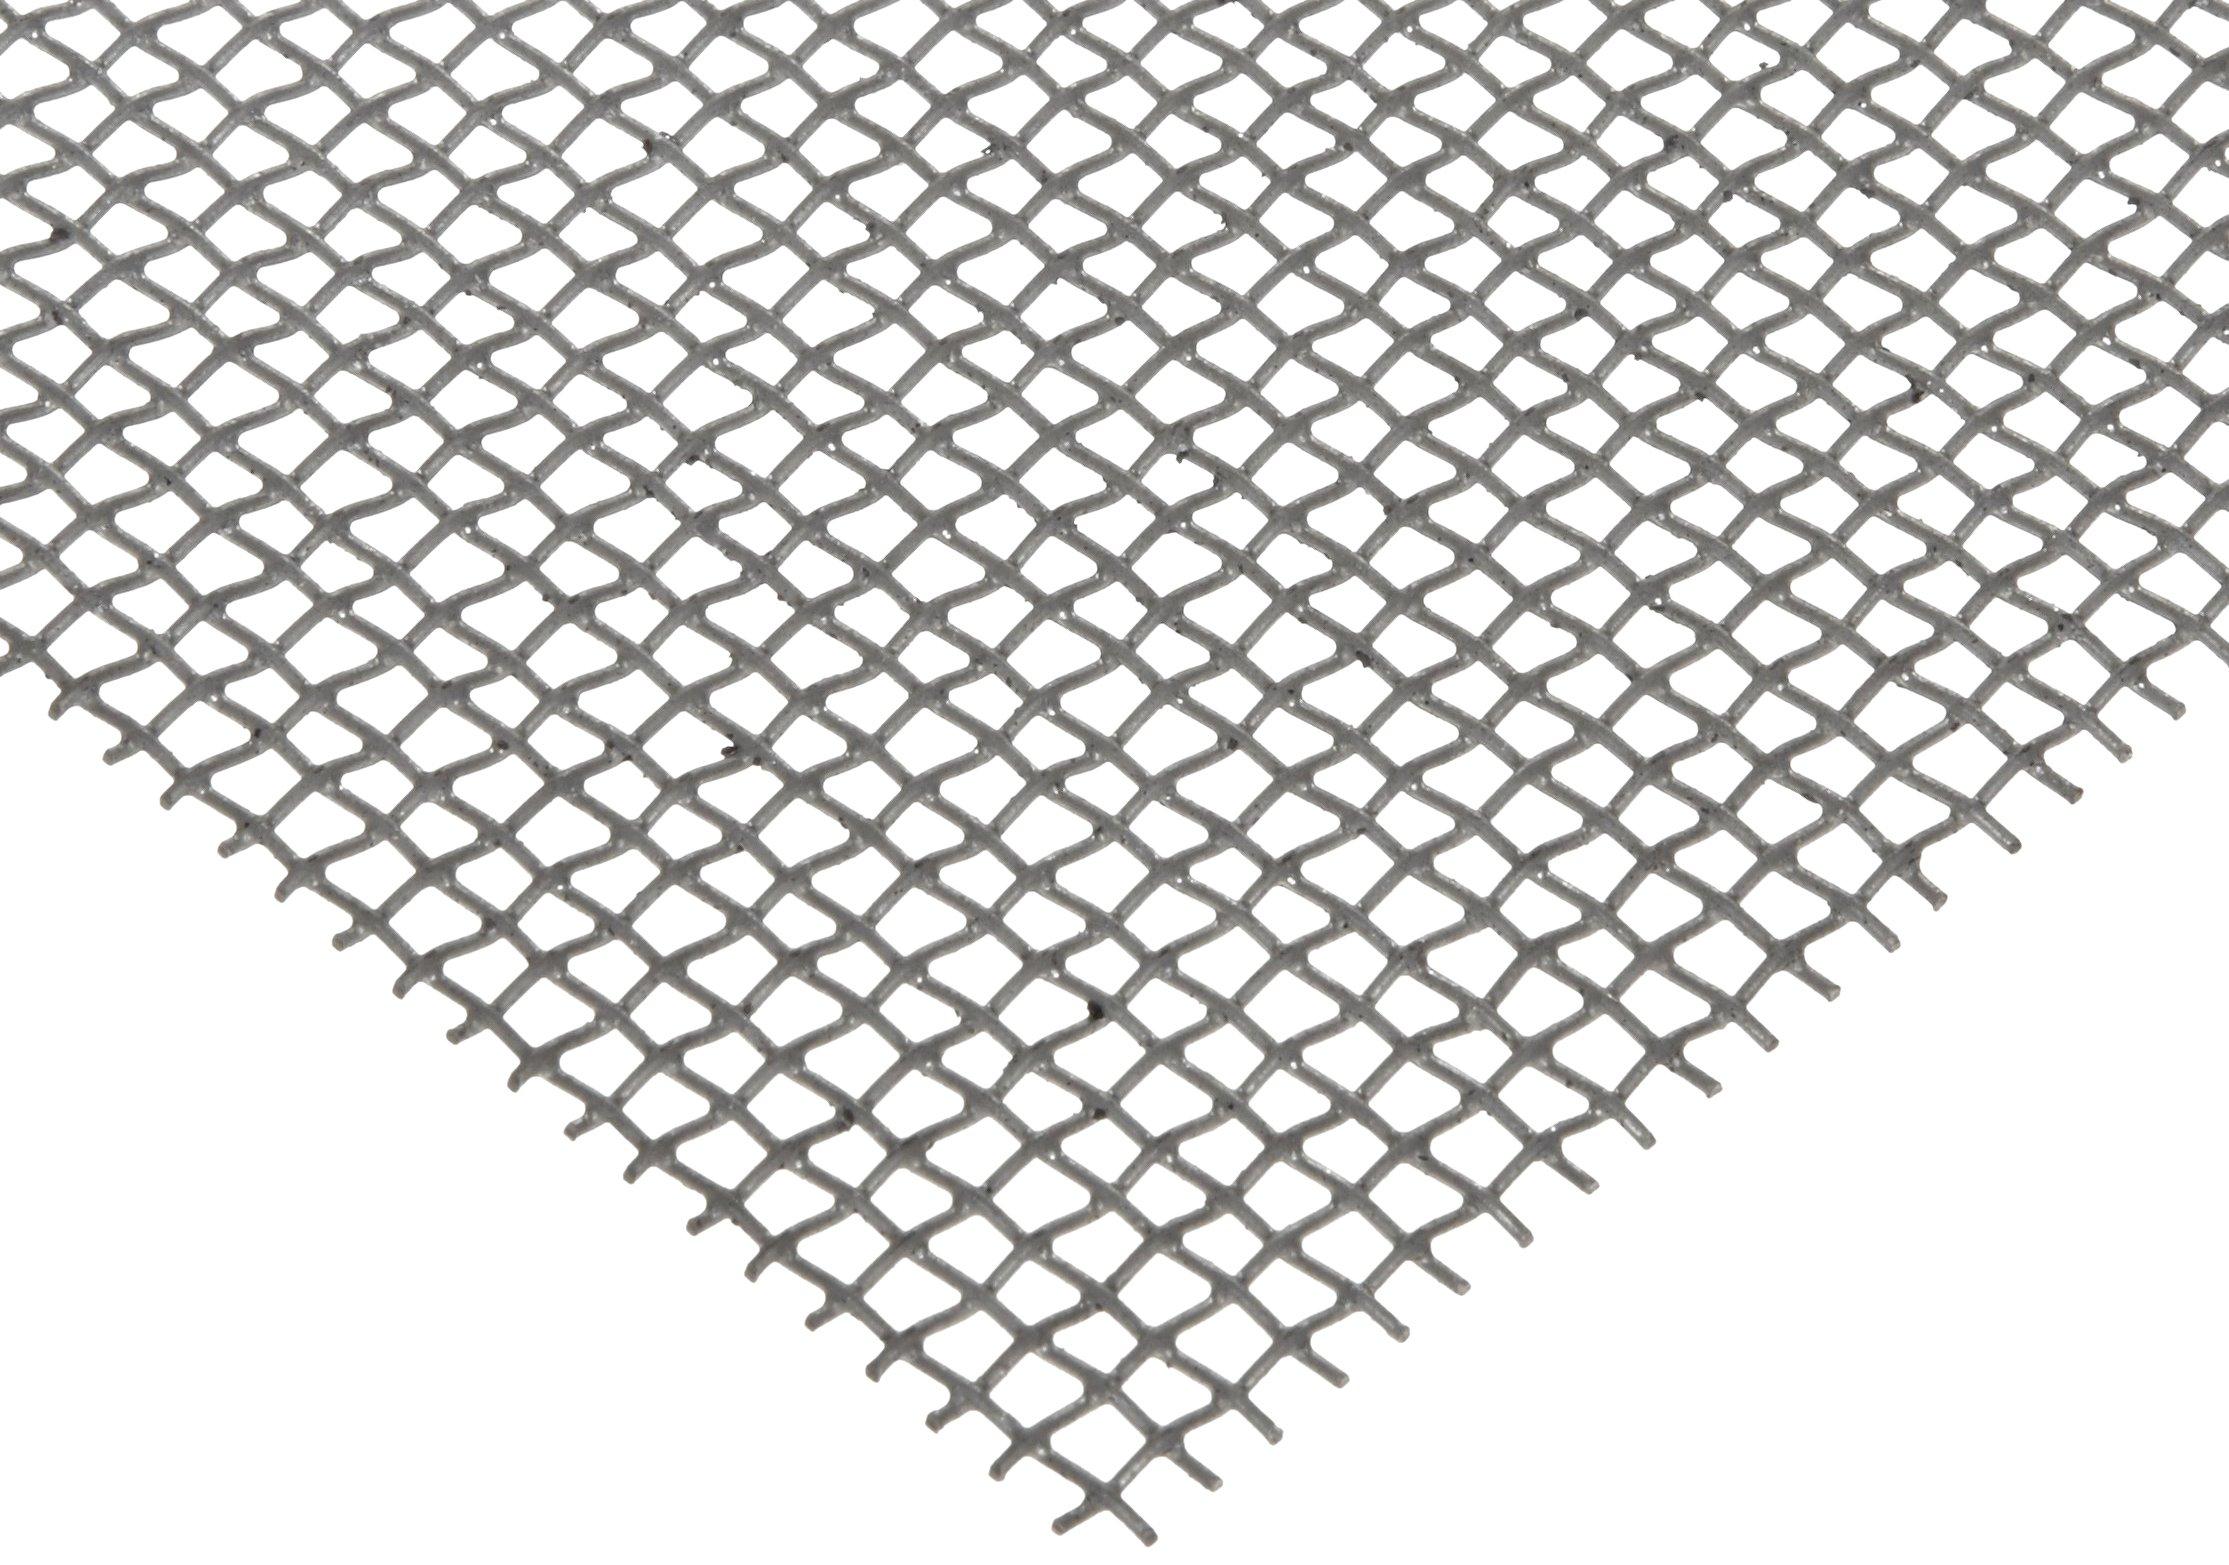 "Steel Woven Mesh Sheet, Zinc Galvanized Finish, 12"" Width, 12"" Length, 0.018"" Wire Diameter, 55% Open Area"